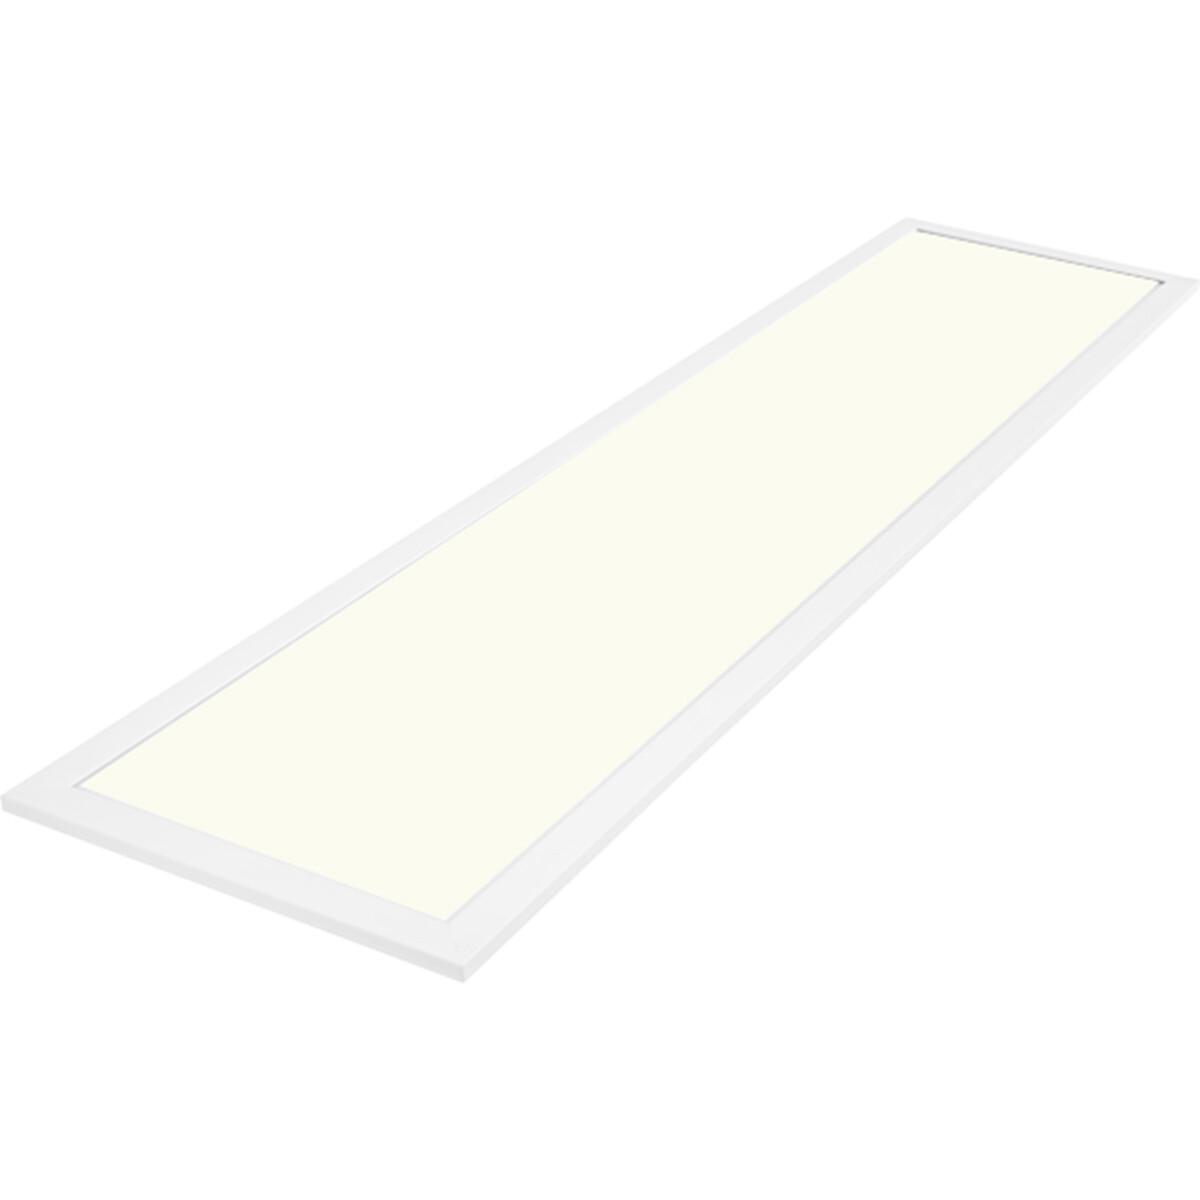 LED Paneel - Aigi - 30x120 Natuurlijk Wit 4000K - 40W Inbouw Rechthoek - Mat Wit - Aluminium - Flikk